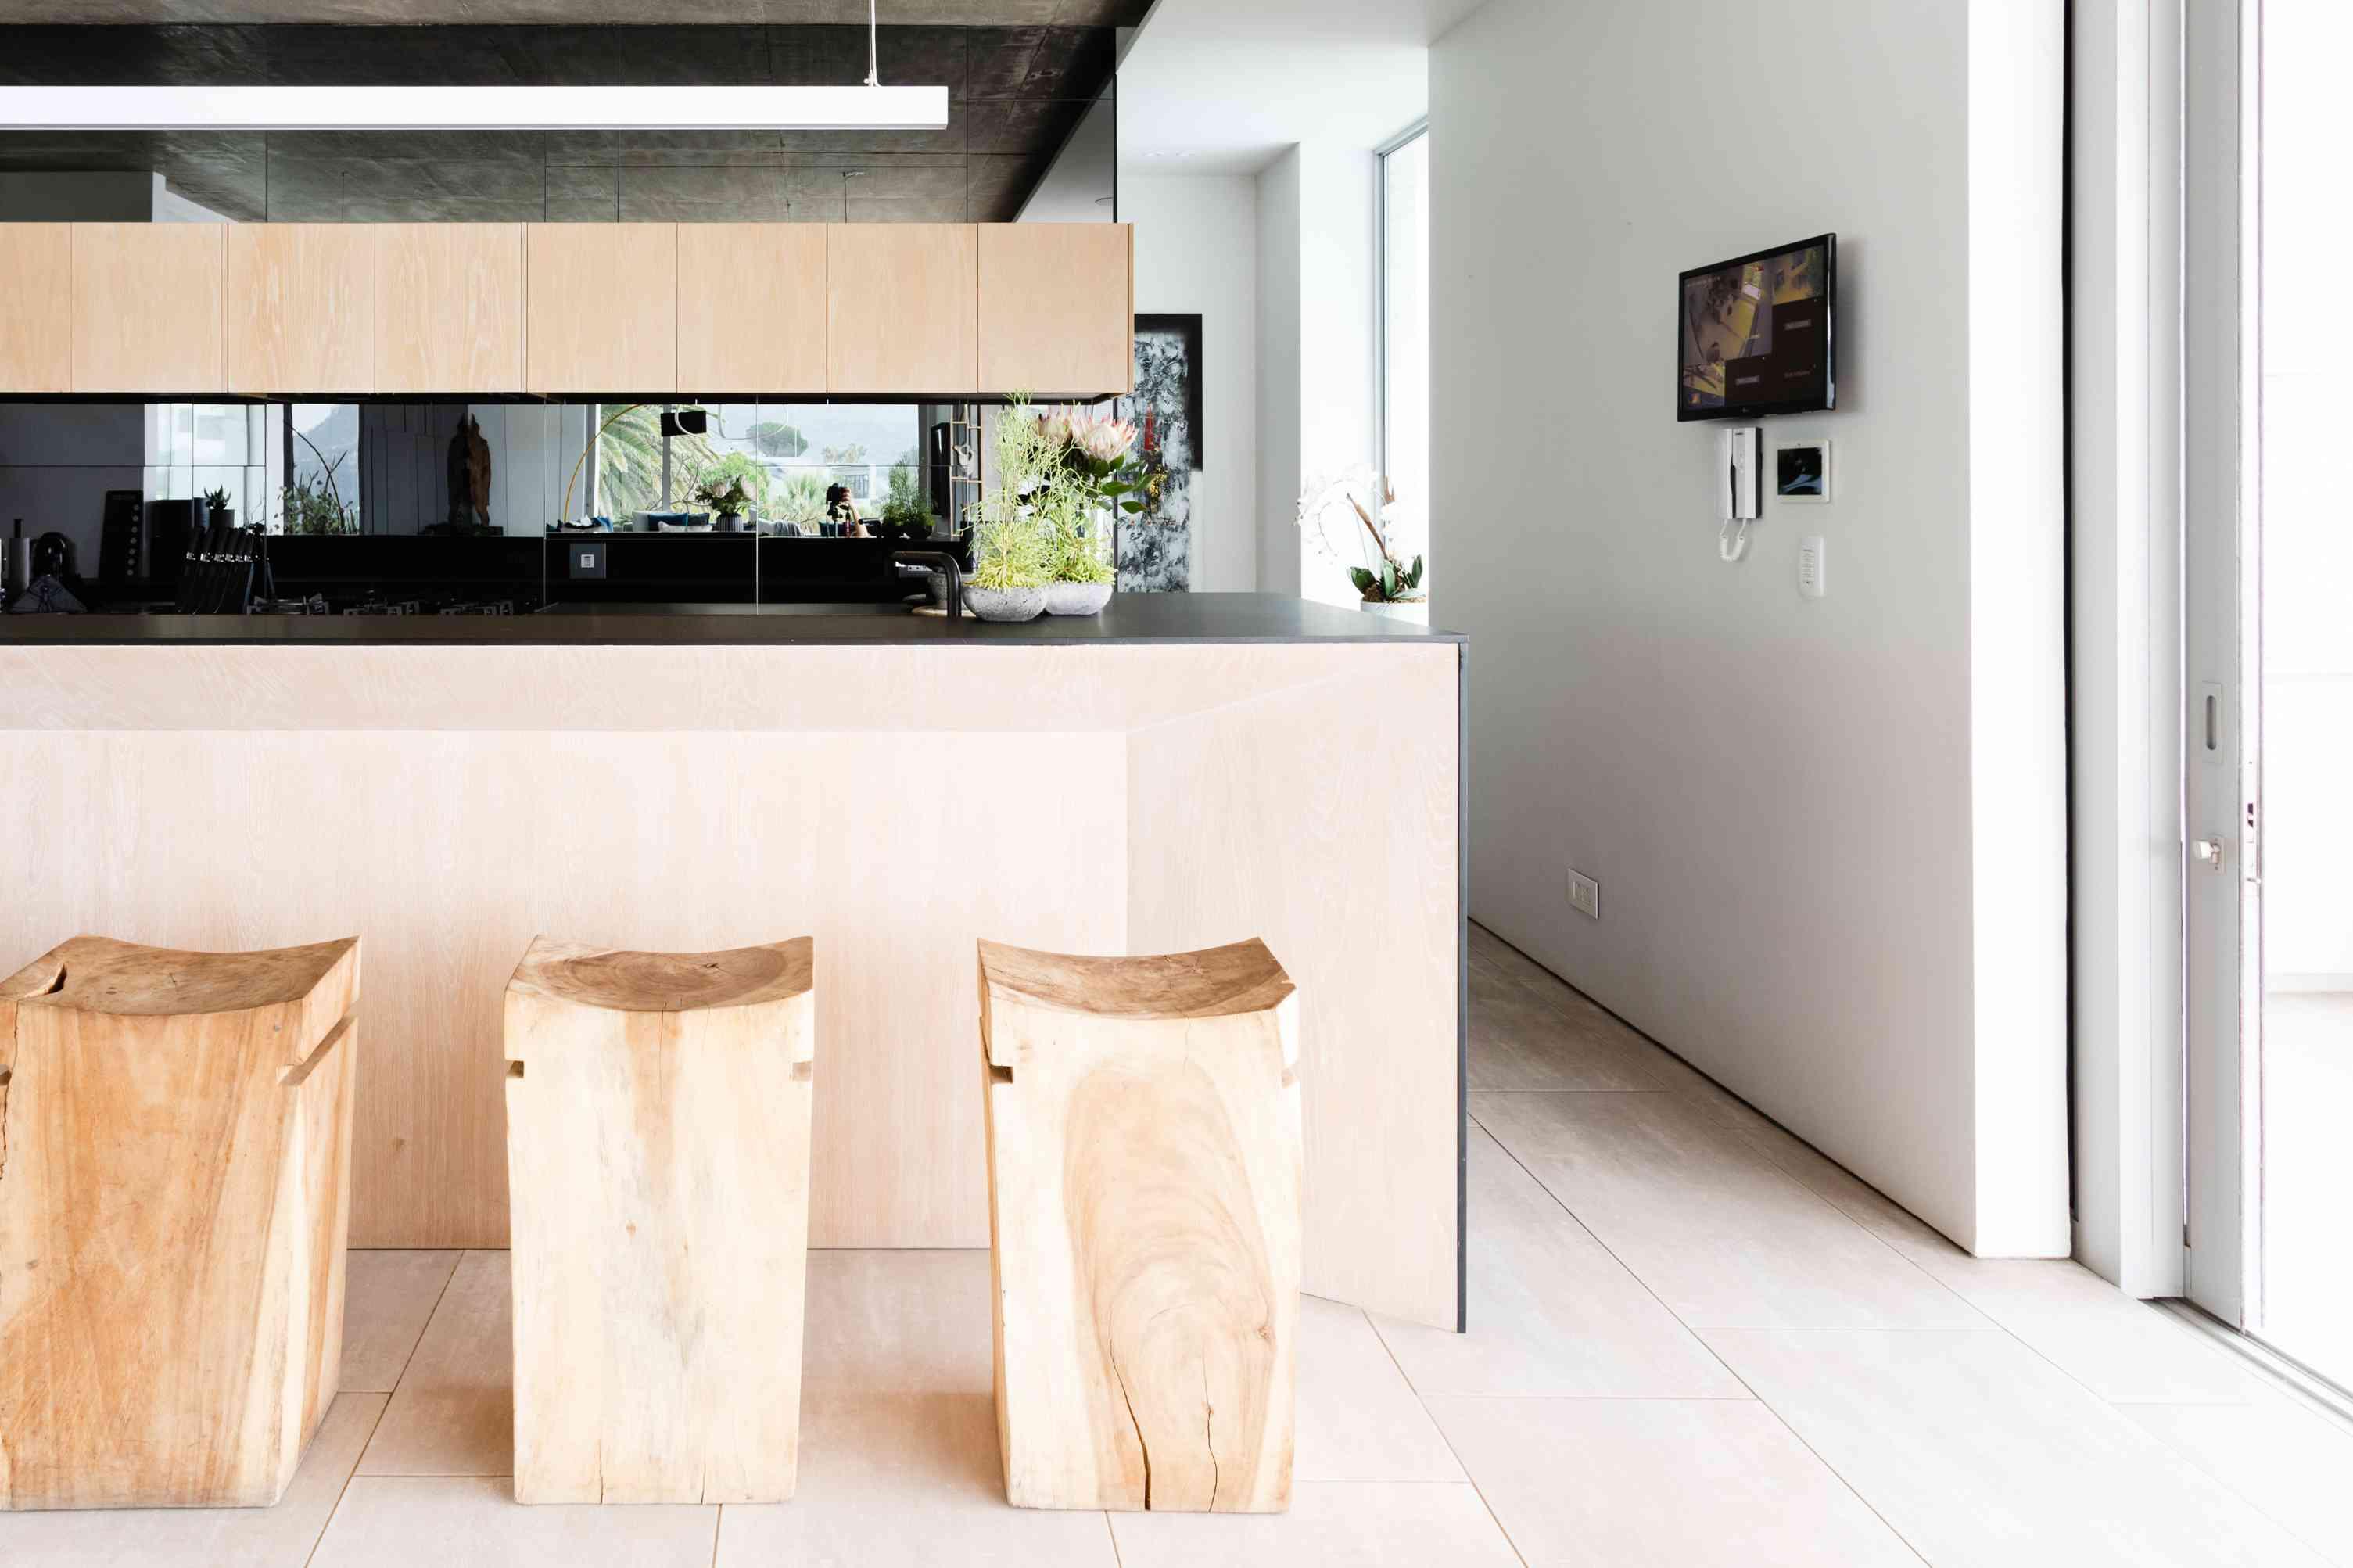 minimalist kitchen island with abundant natural light